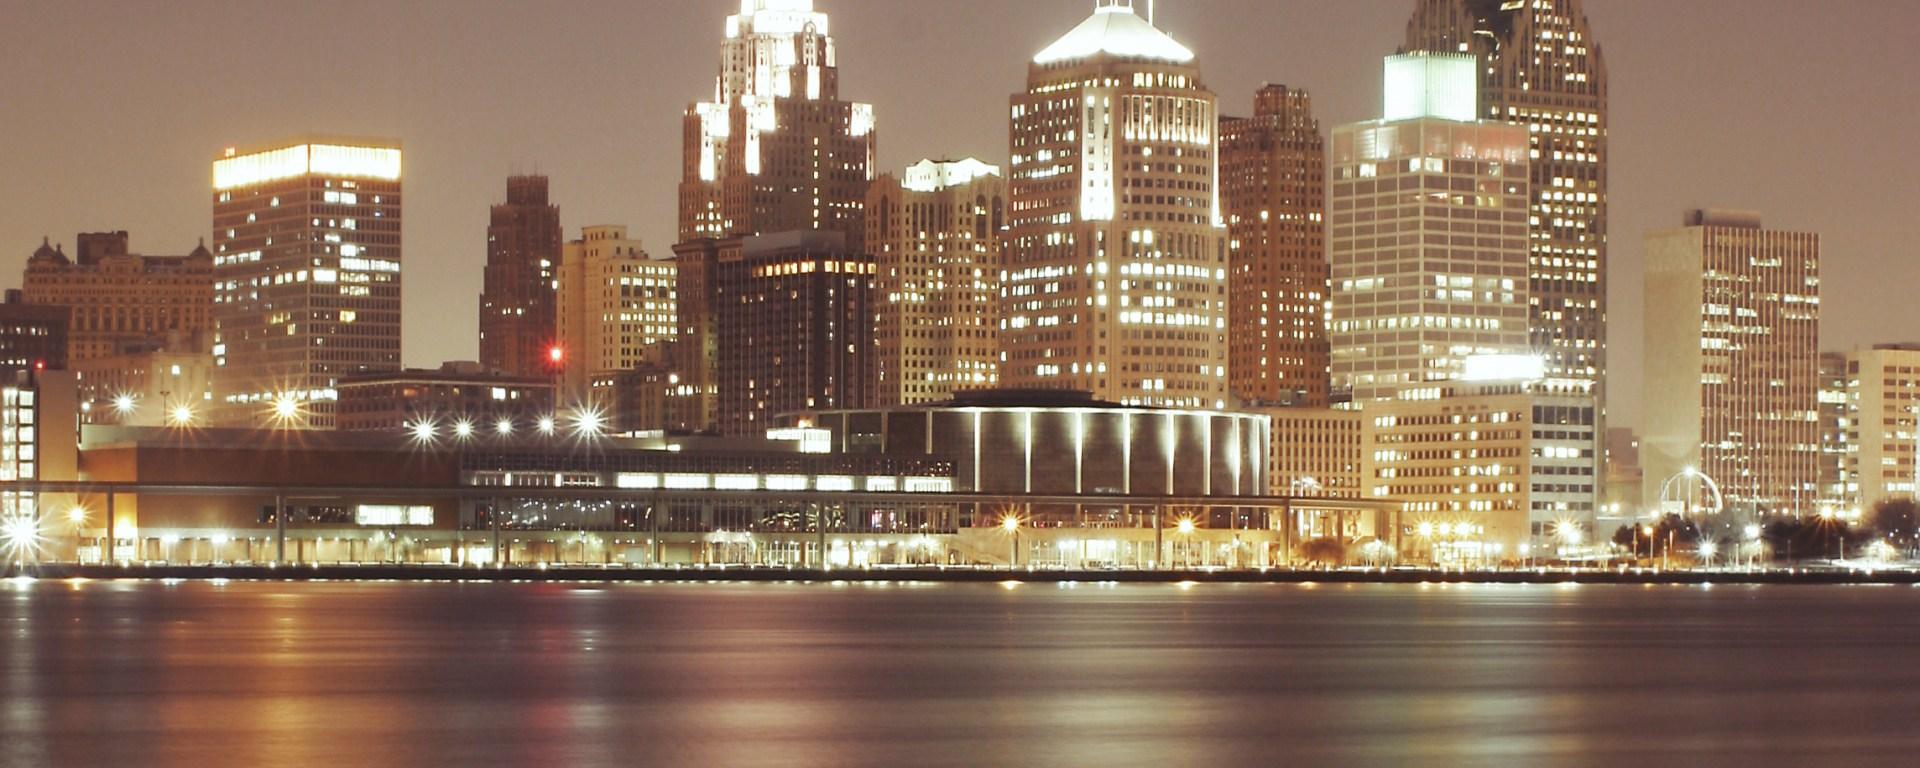 Detroit skyscrapers at night.